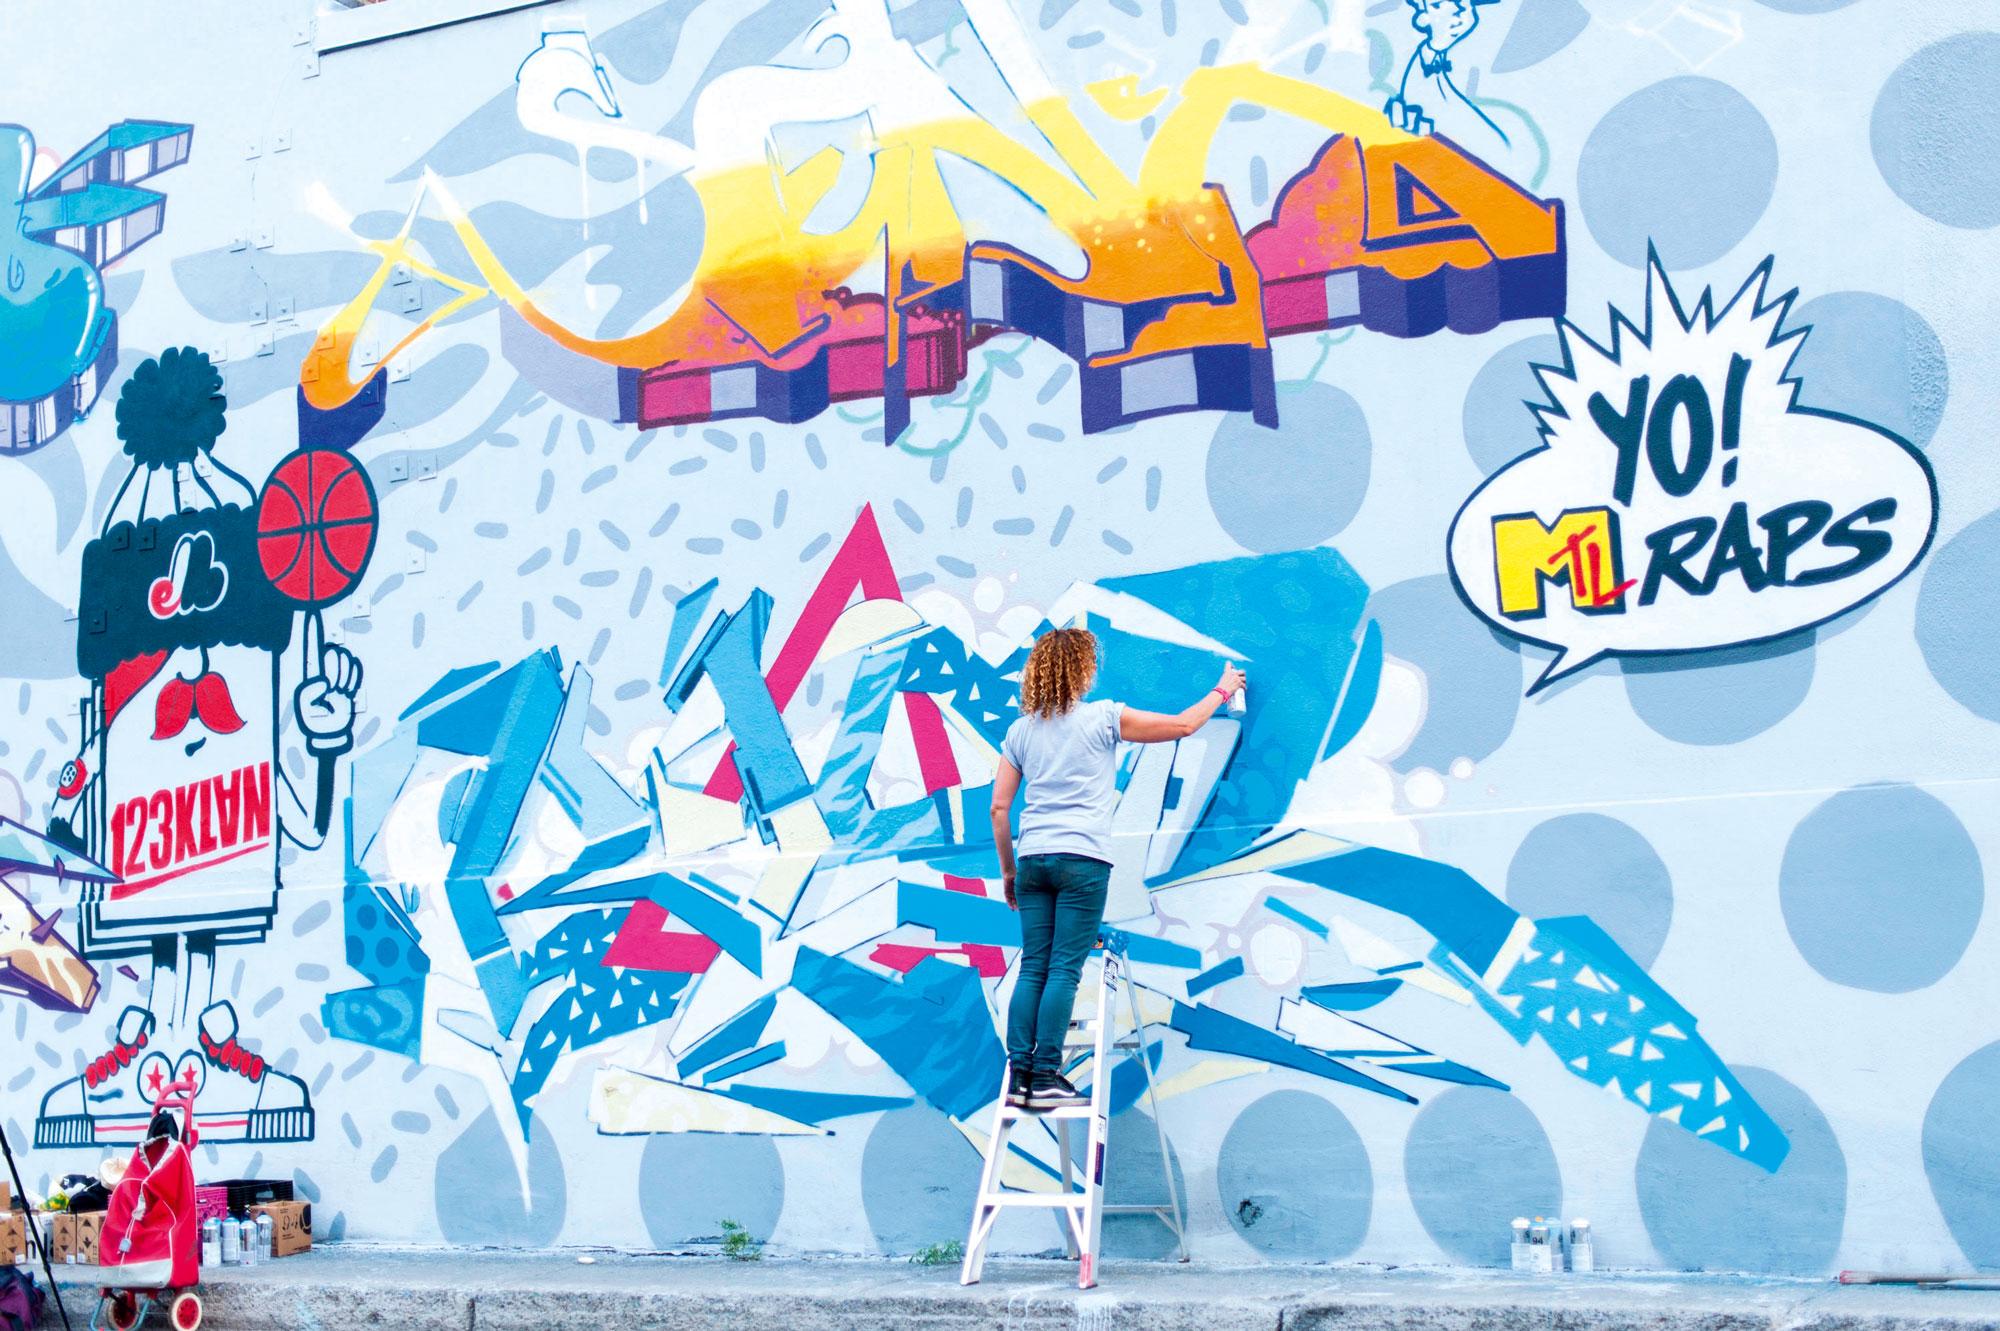 123Klan's artwork at the Under Pressure Festival in Montreal in 2015. Photo: Le Babillard/Alamy